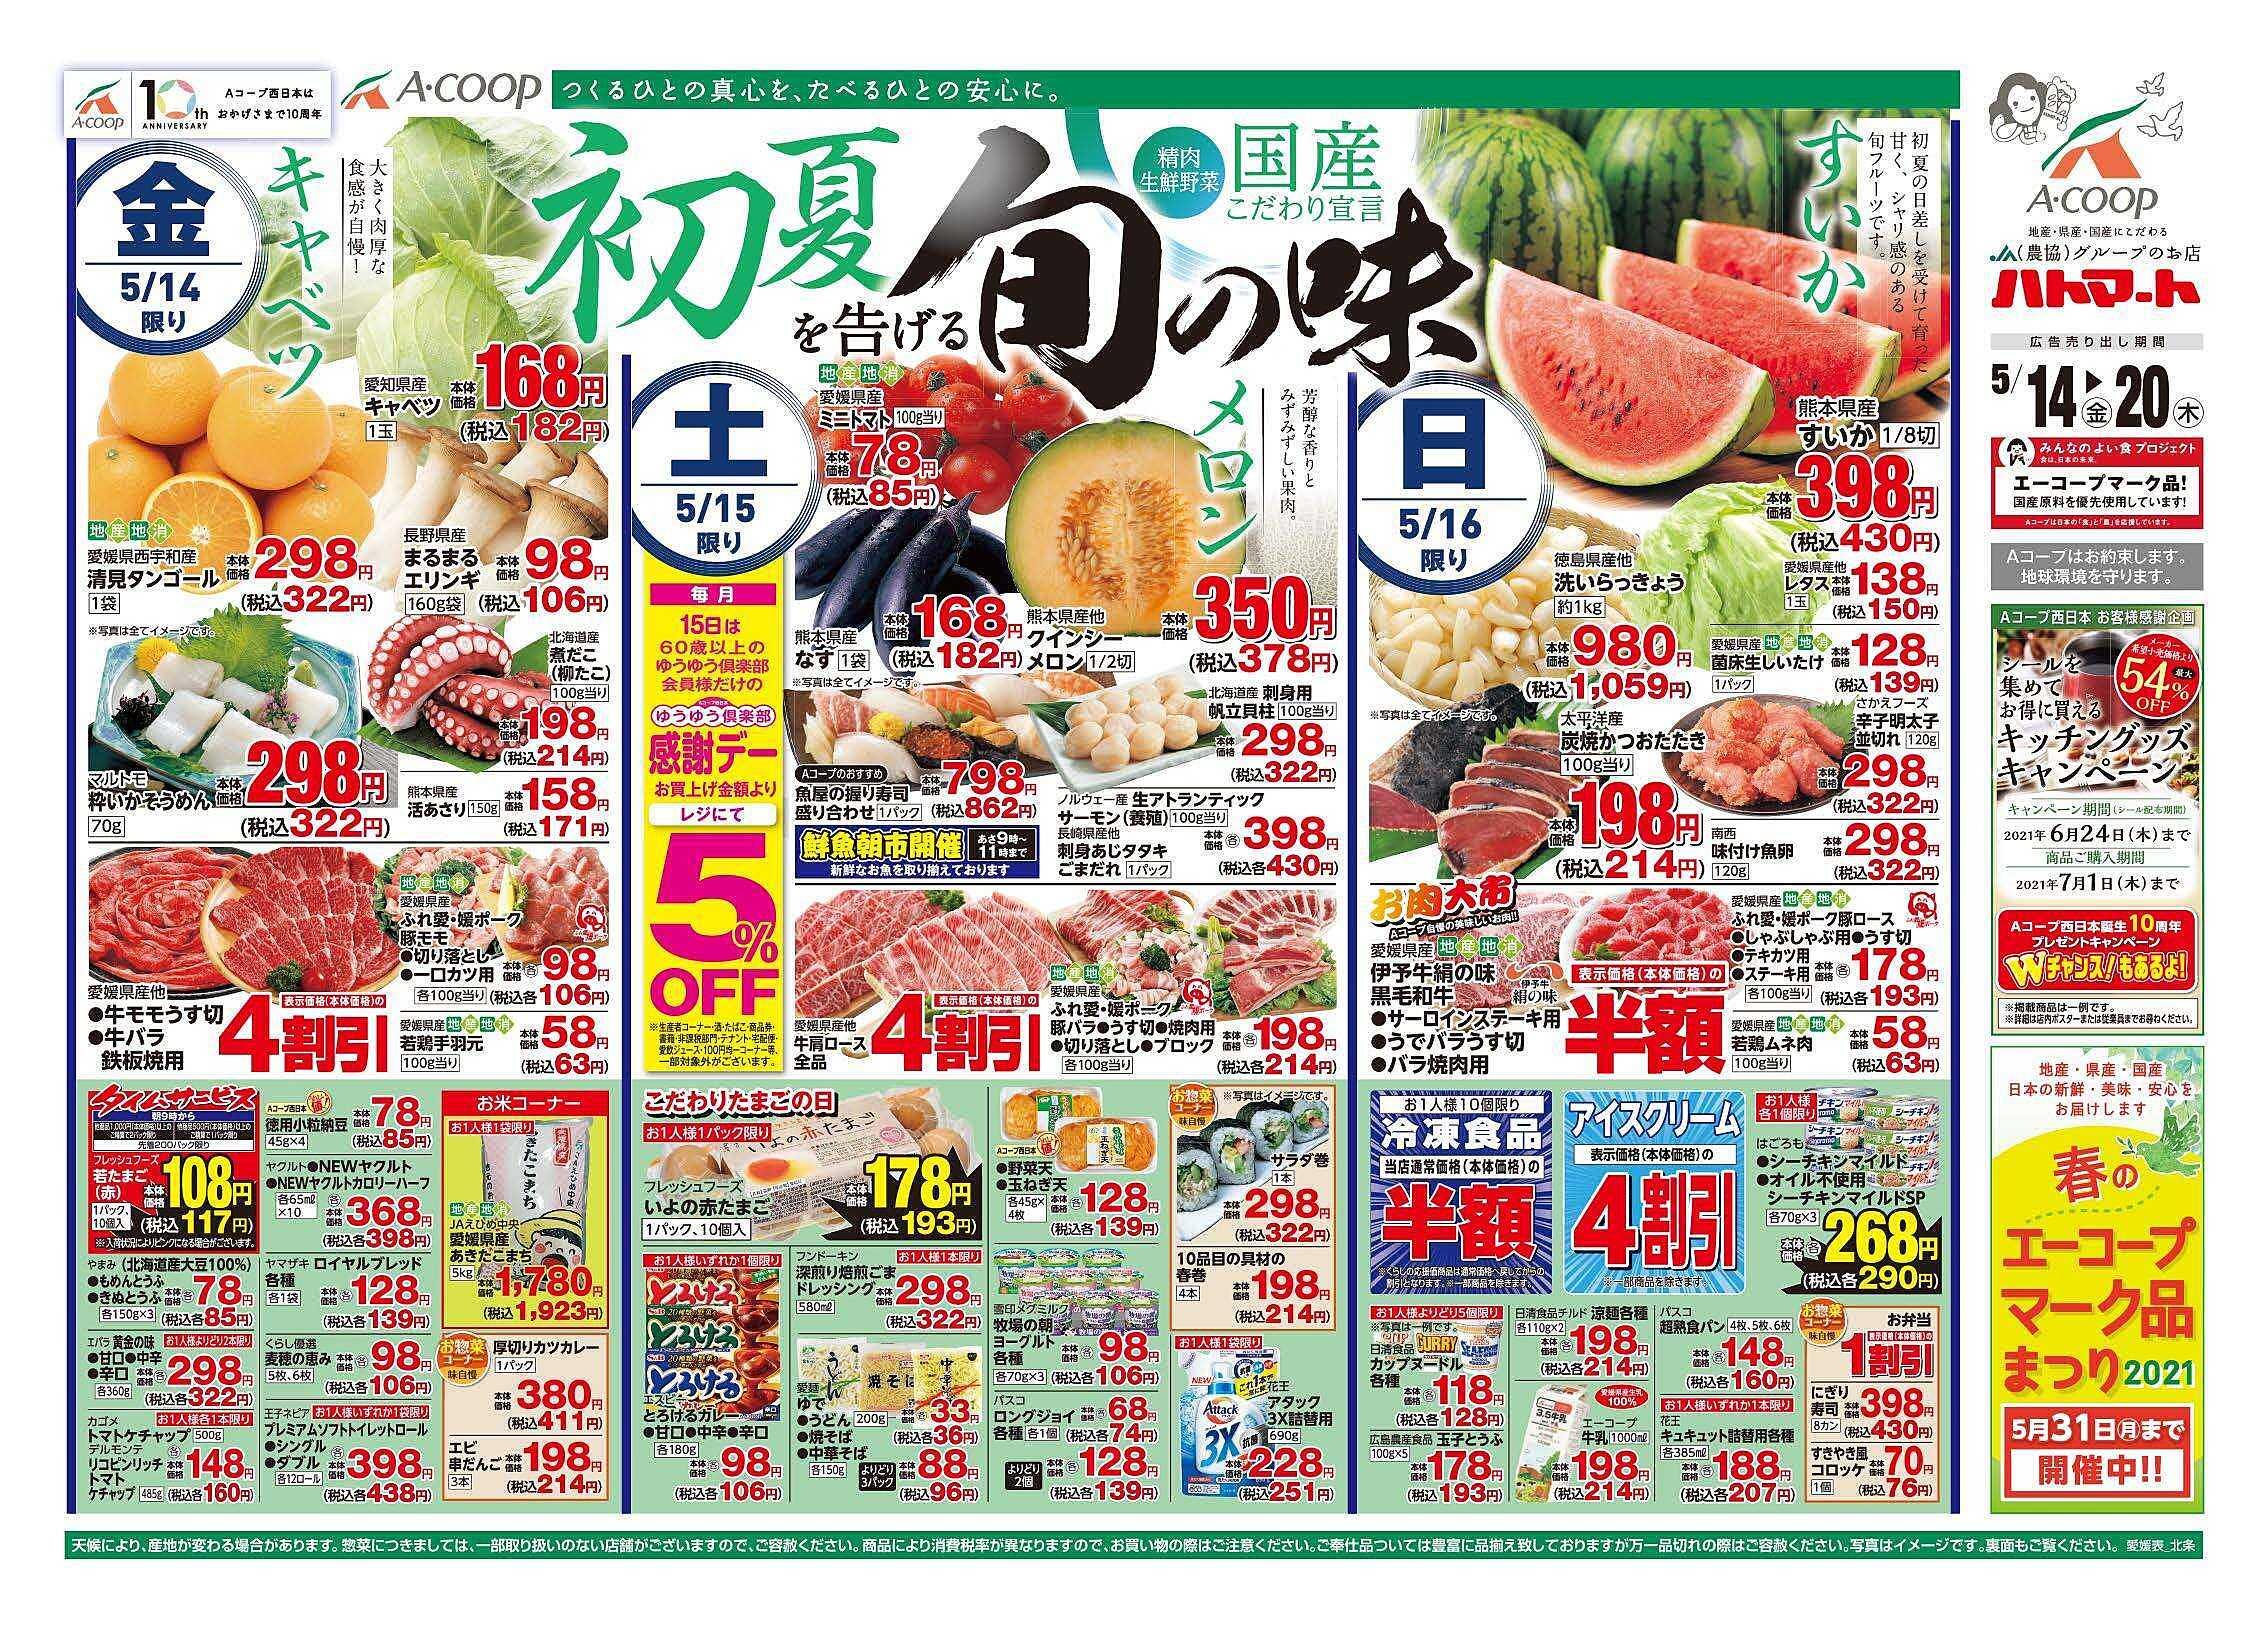 Aコープ西日本 5/14(金)~5/20(木)限り